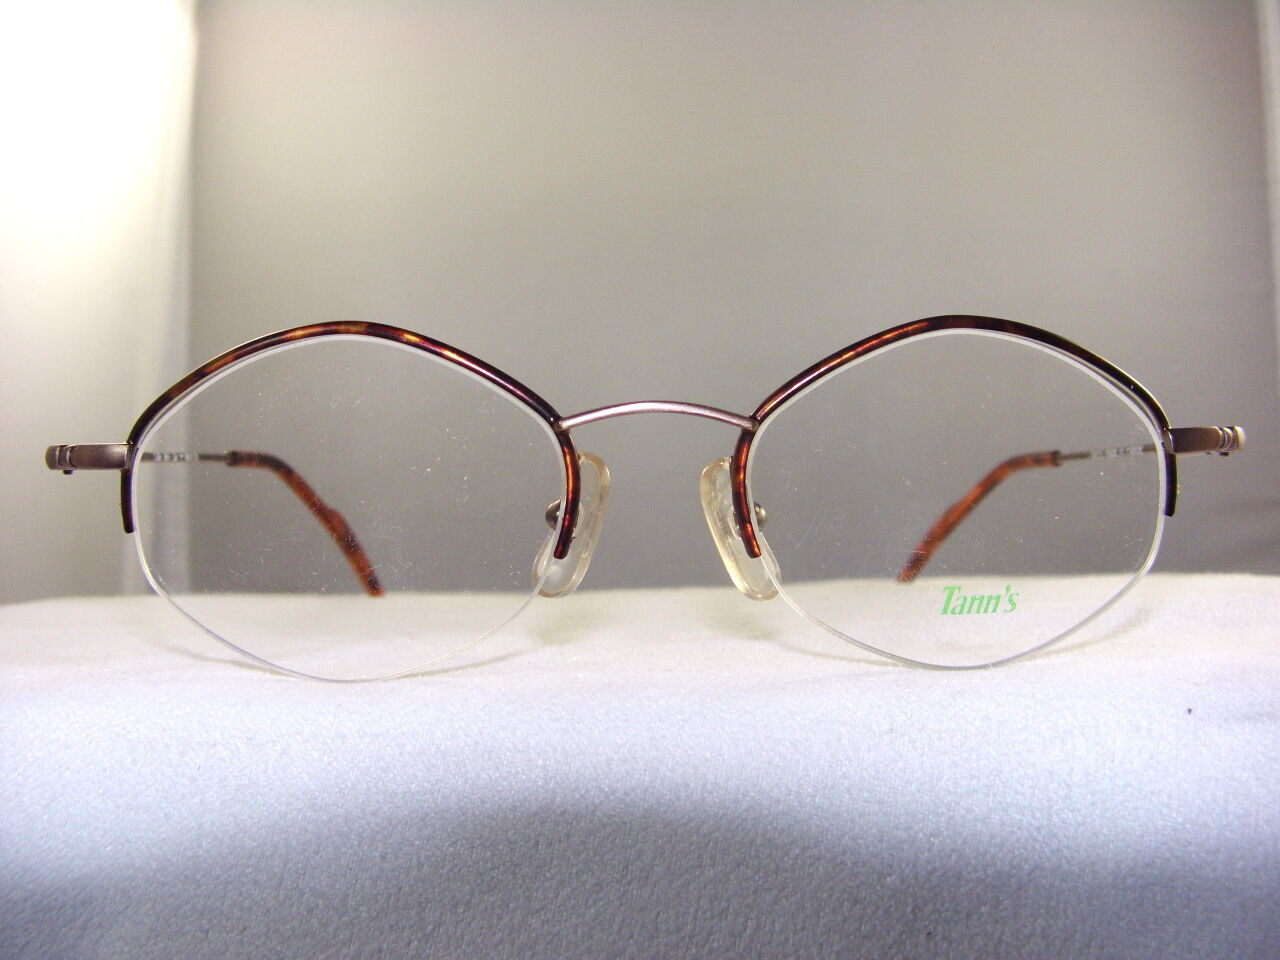 Eyeglass Frames Size 43 : TANNS 967 TORTOISE DIAMOND EYEGLASS FRAME SIZE 43-18 eBay